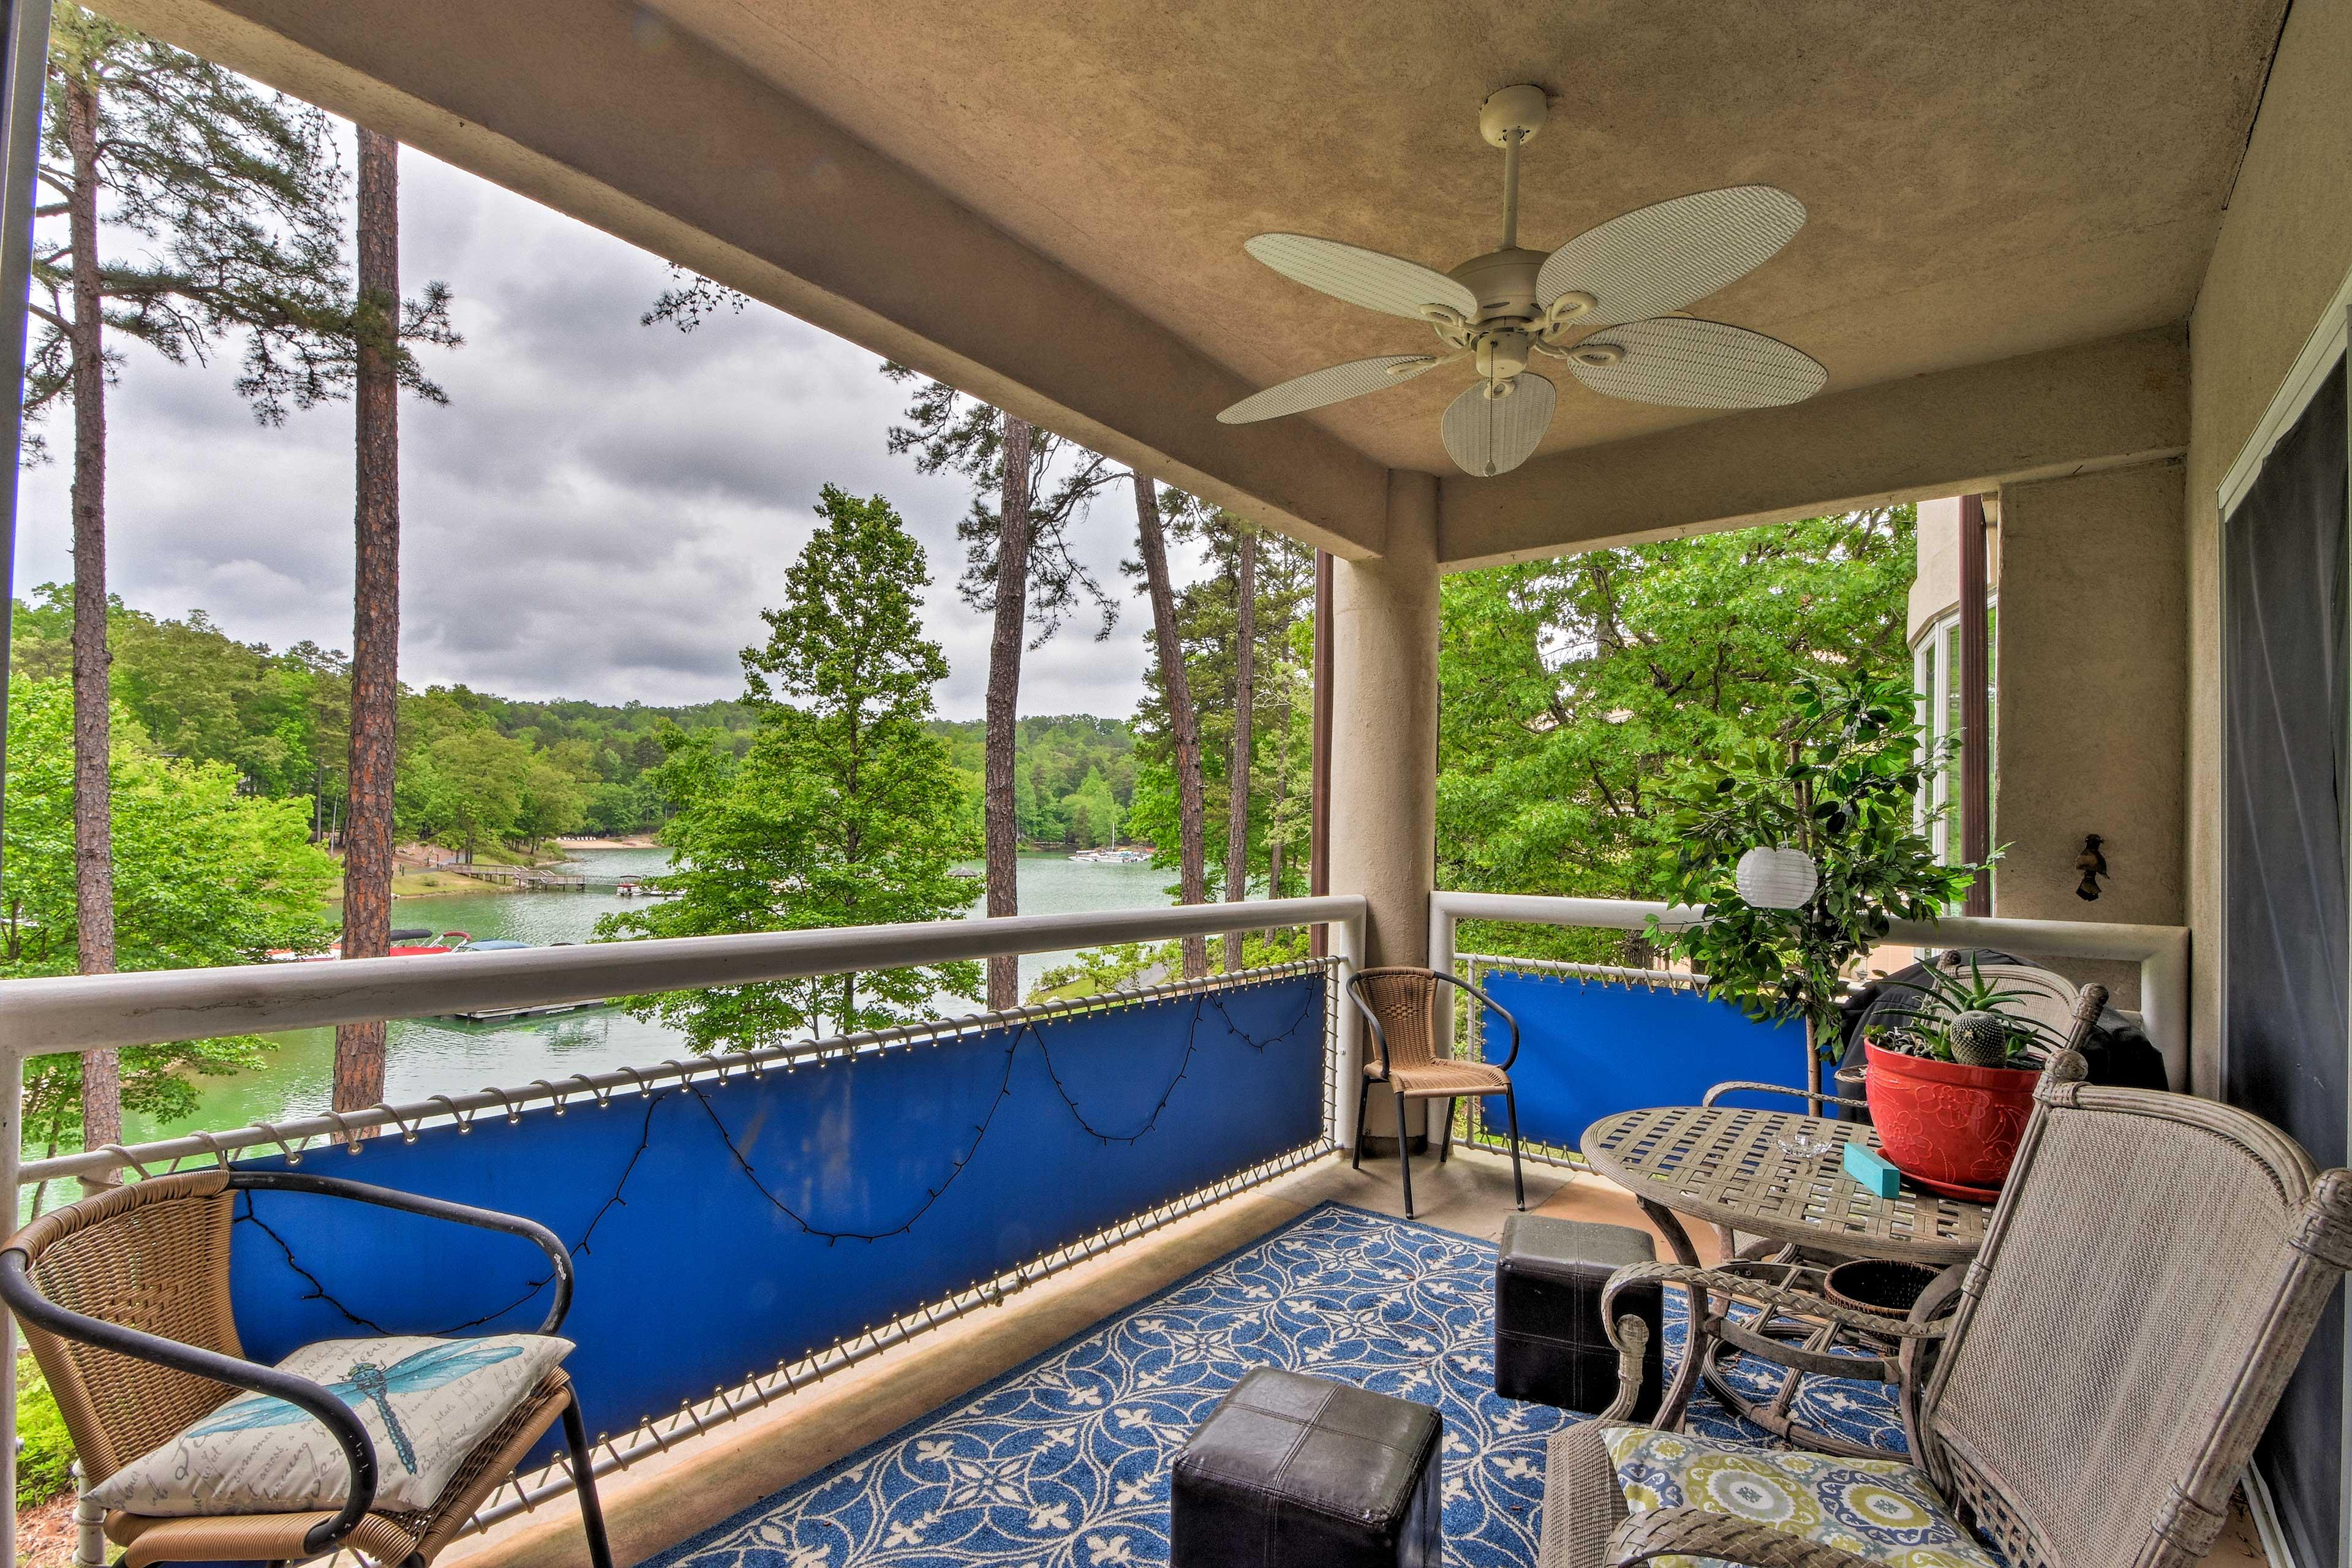 Soak in views of the water at this 2-bedroom, 2-bath Salem vacation rental.